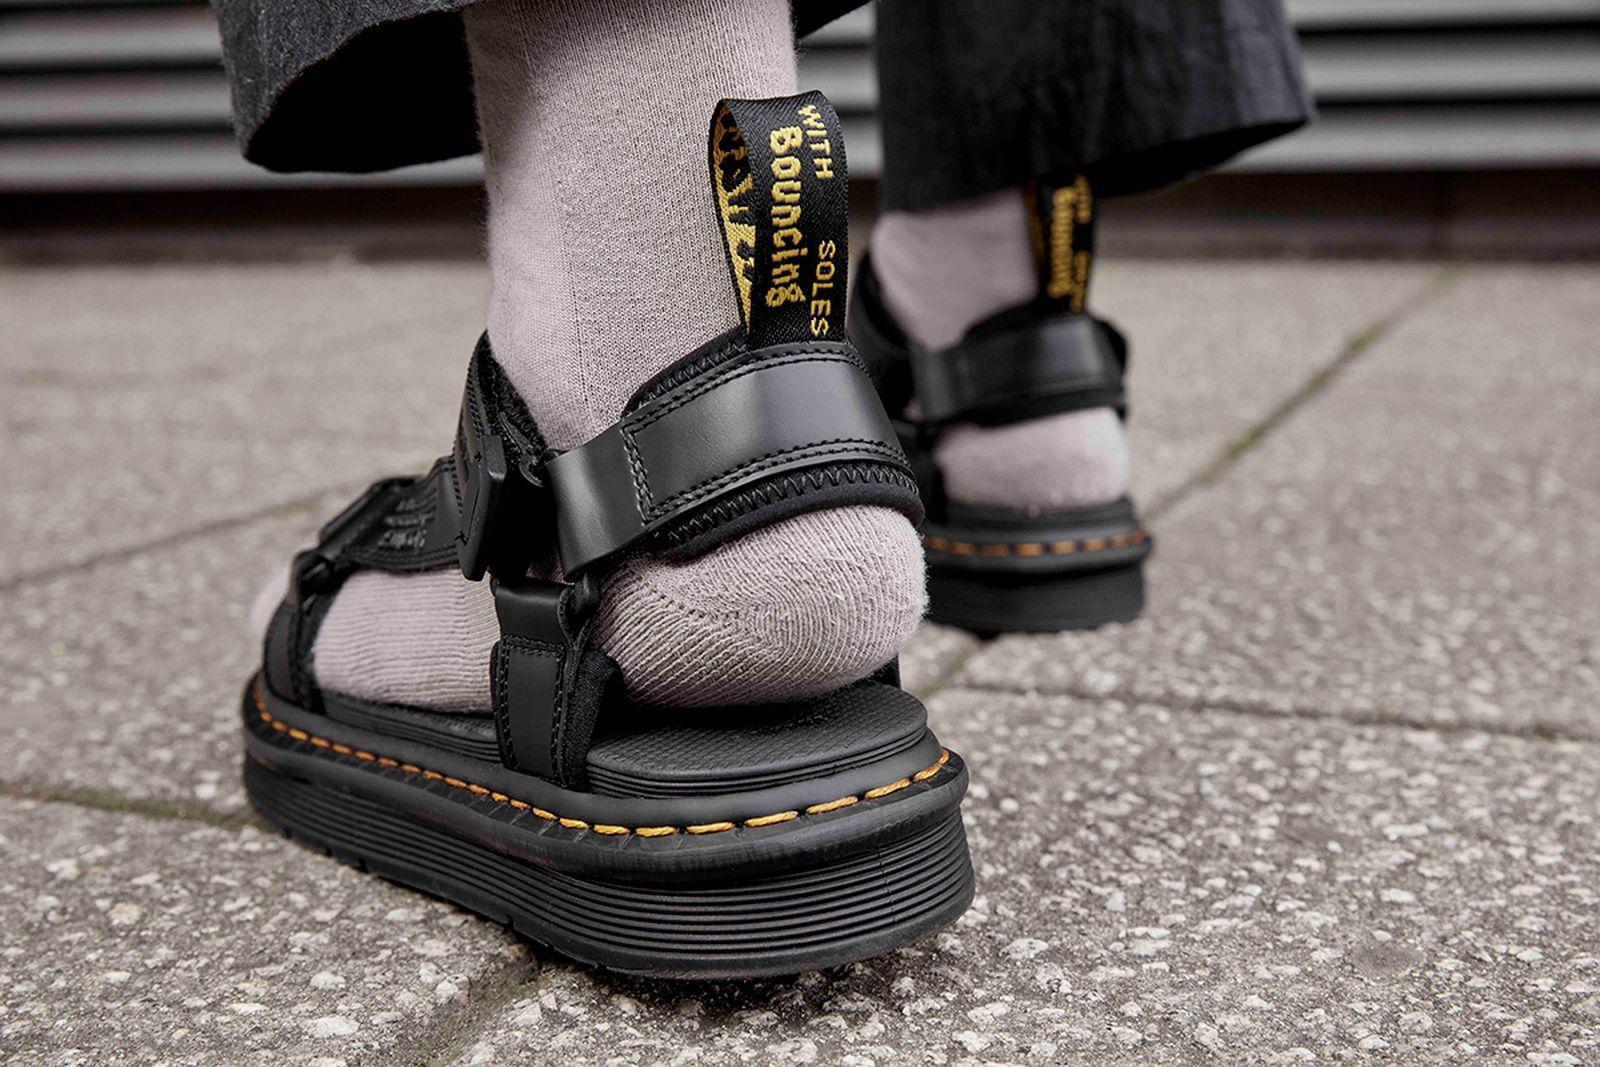 dr-martens-suicoke-sandals-release-date-price-mood-02